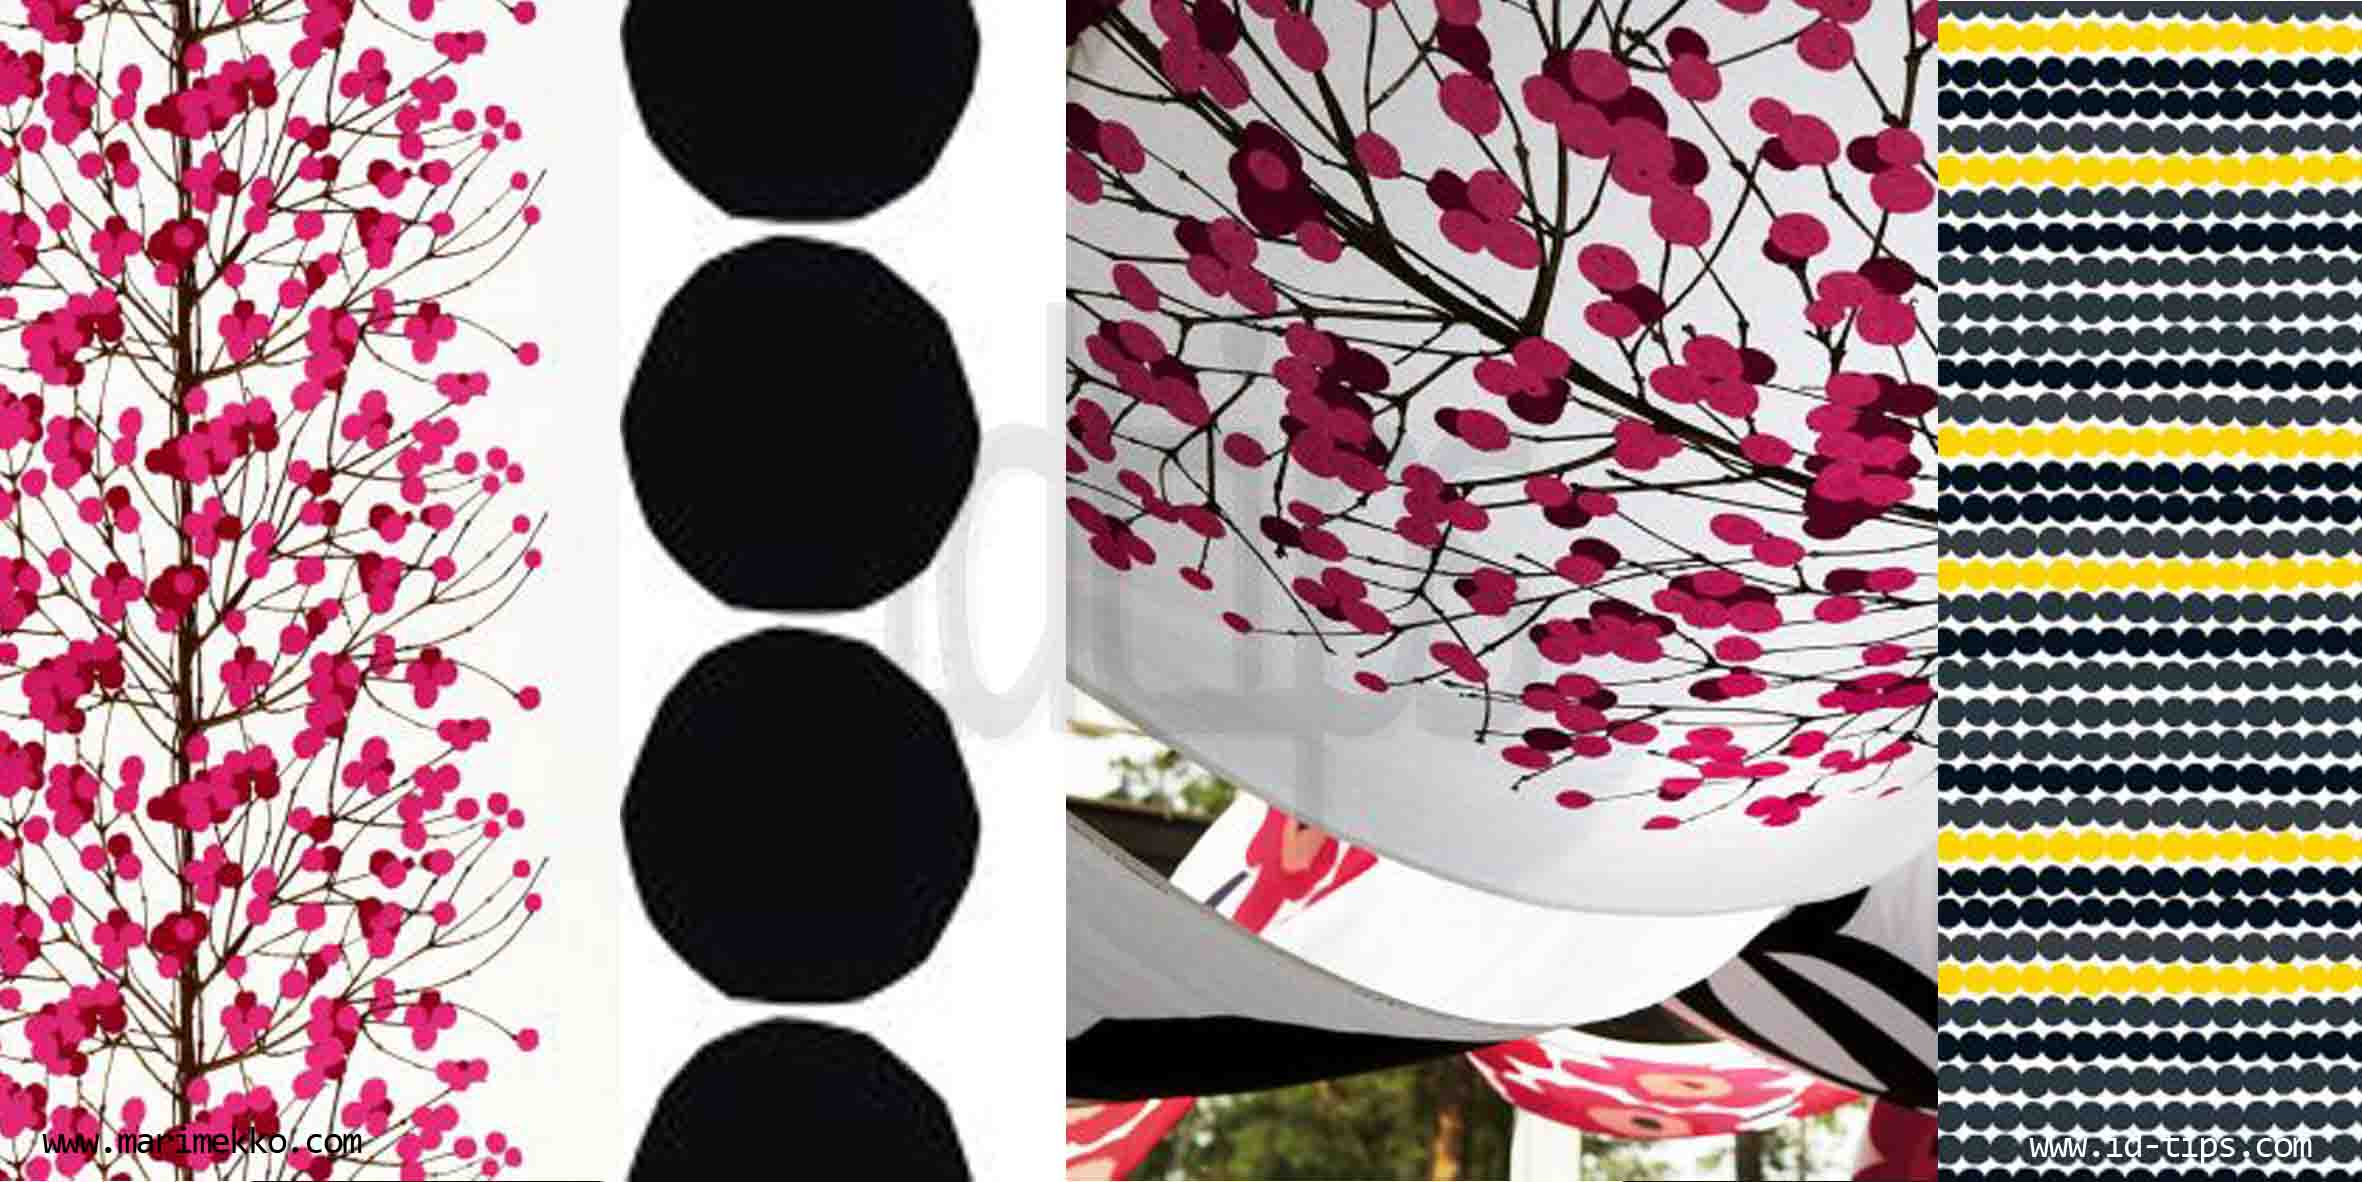 Marimekko Stoffe marimekko stoffe rsymatto stoff marimekko stoff fabric fandango